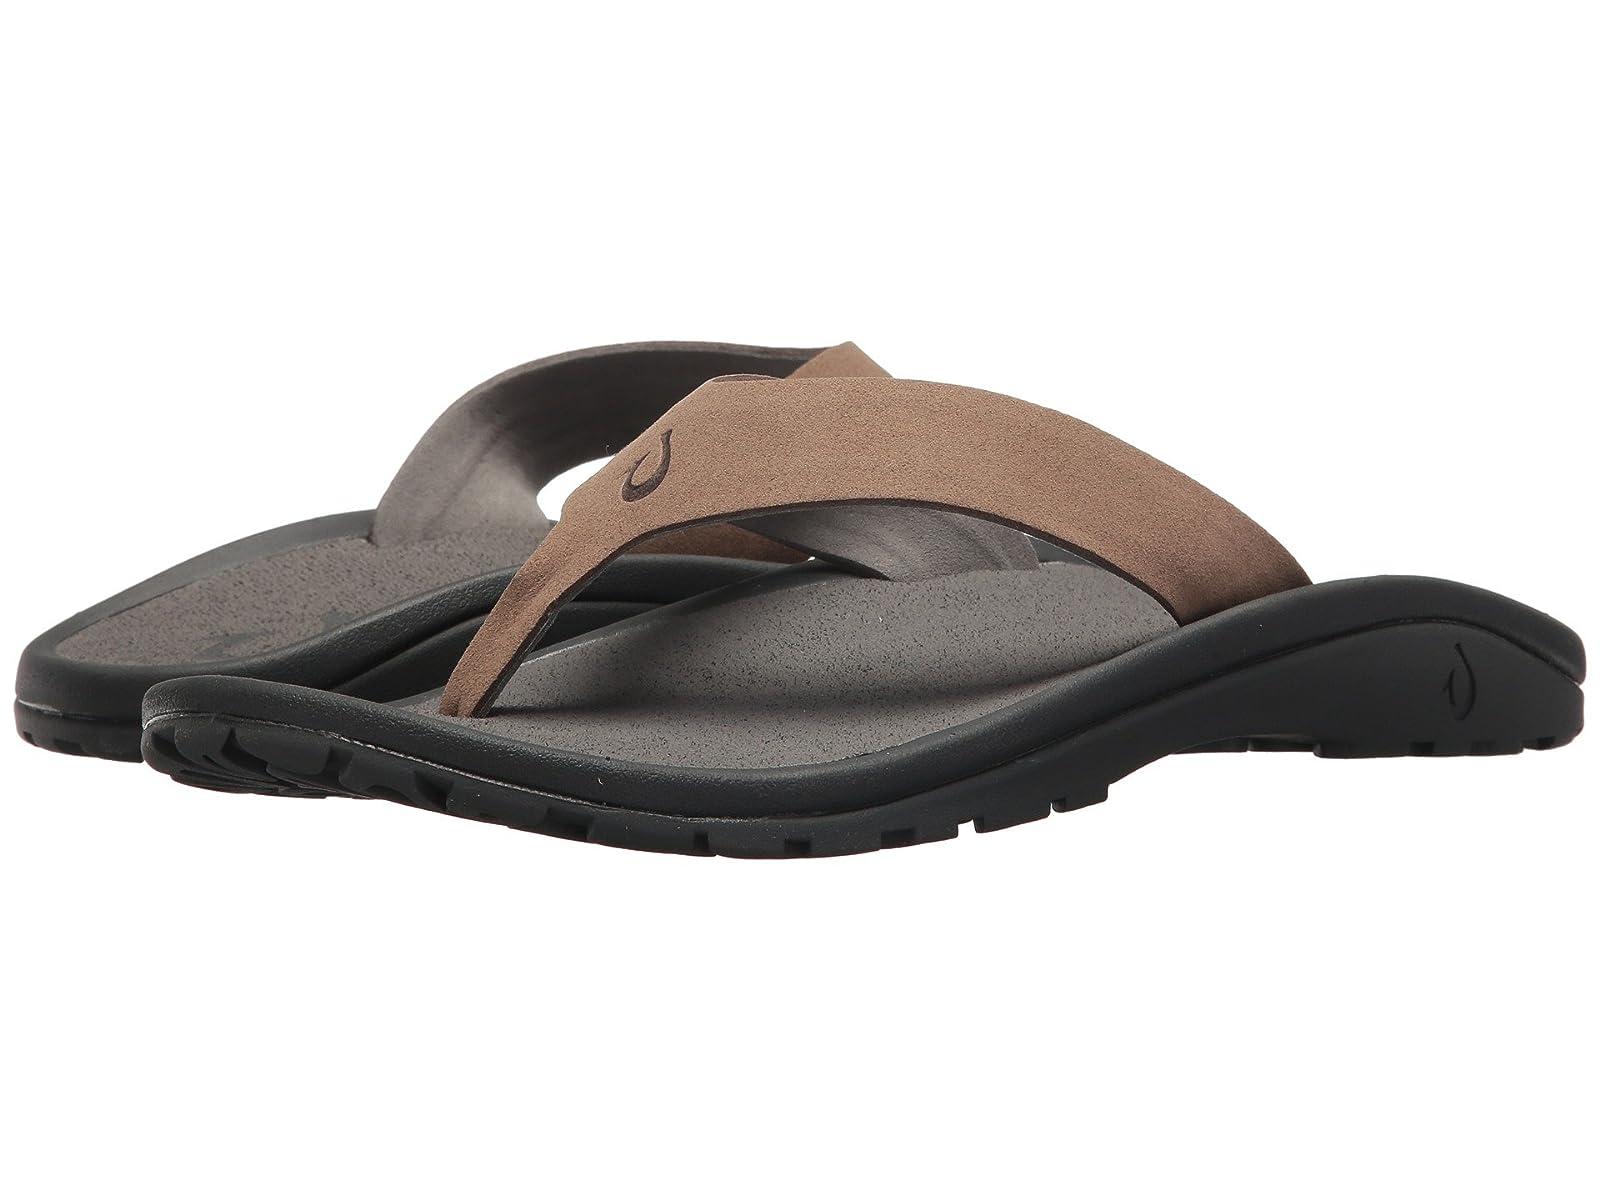 OluKai 'Ohana Ho'okahiAtmospheric grades have affordable shoes